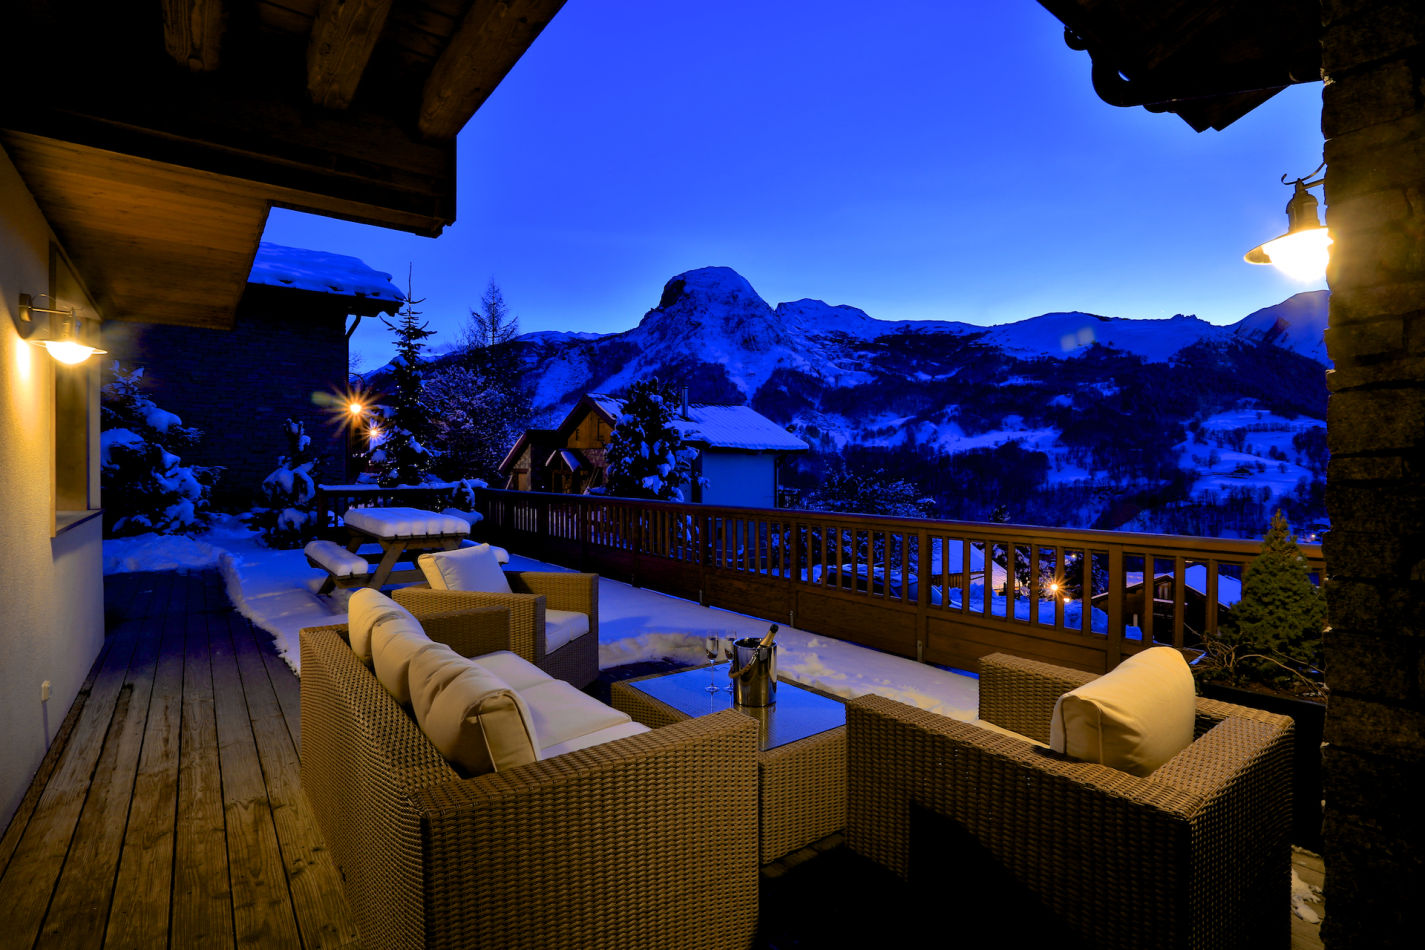 evening-terrace-image-134